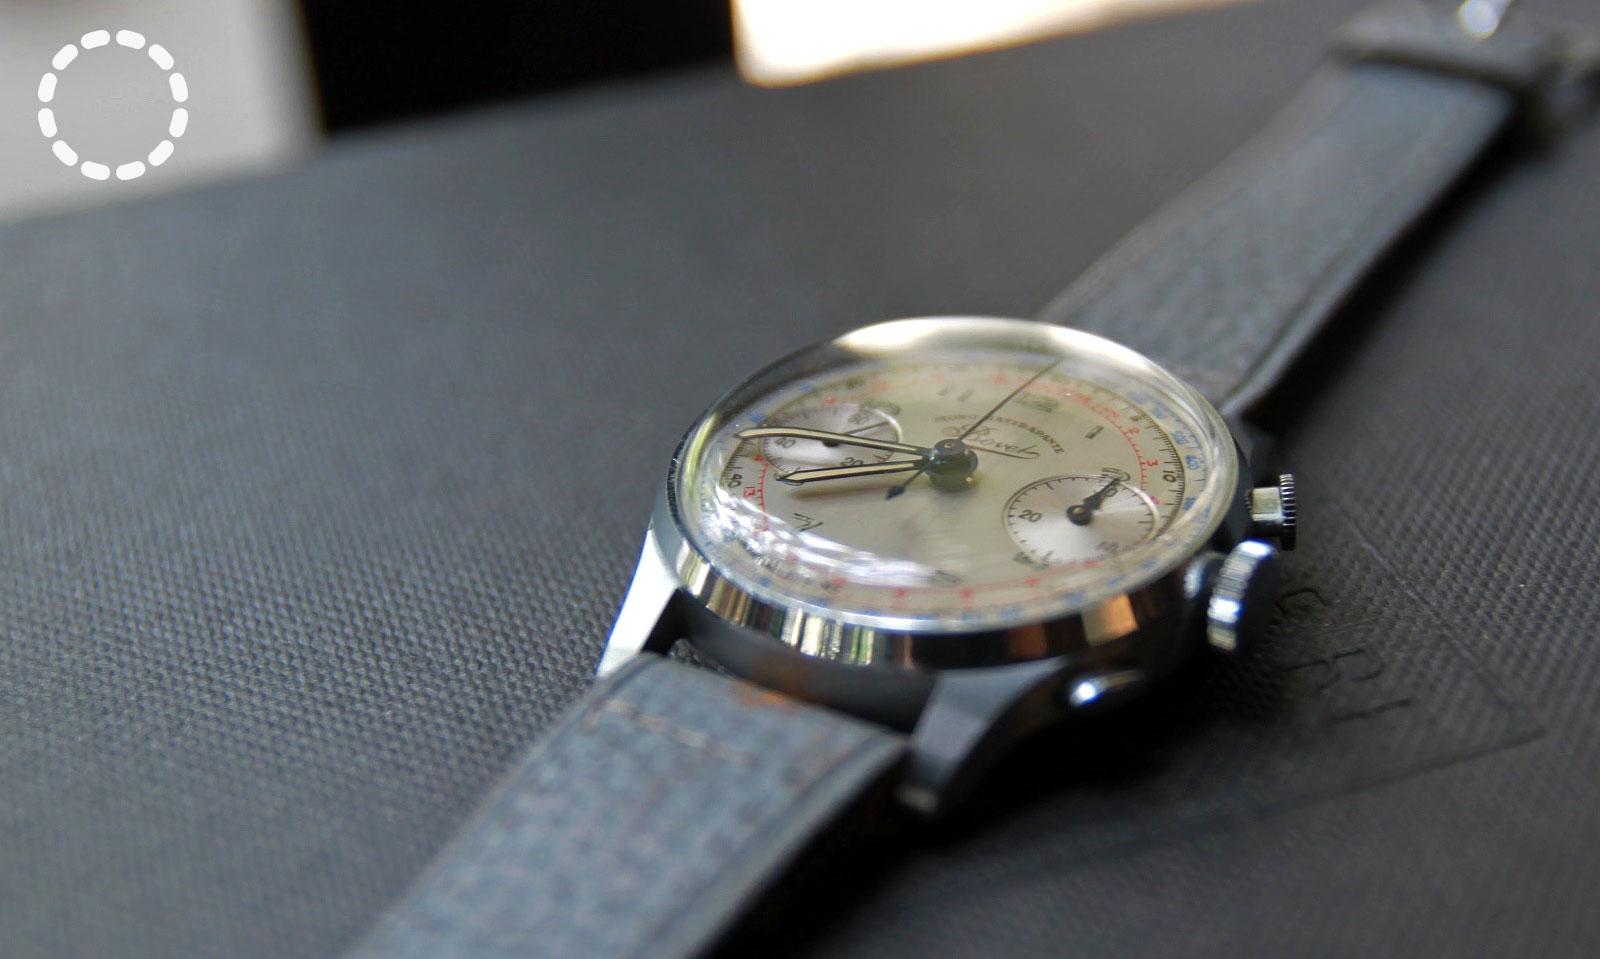 Bovet Mono-Rattrapante Chronograph 2